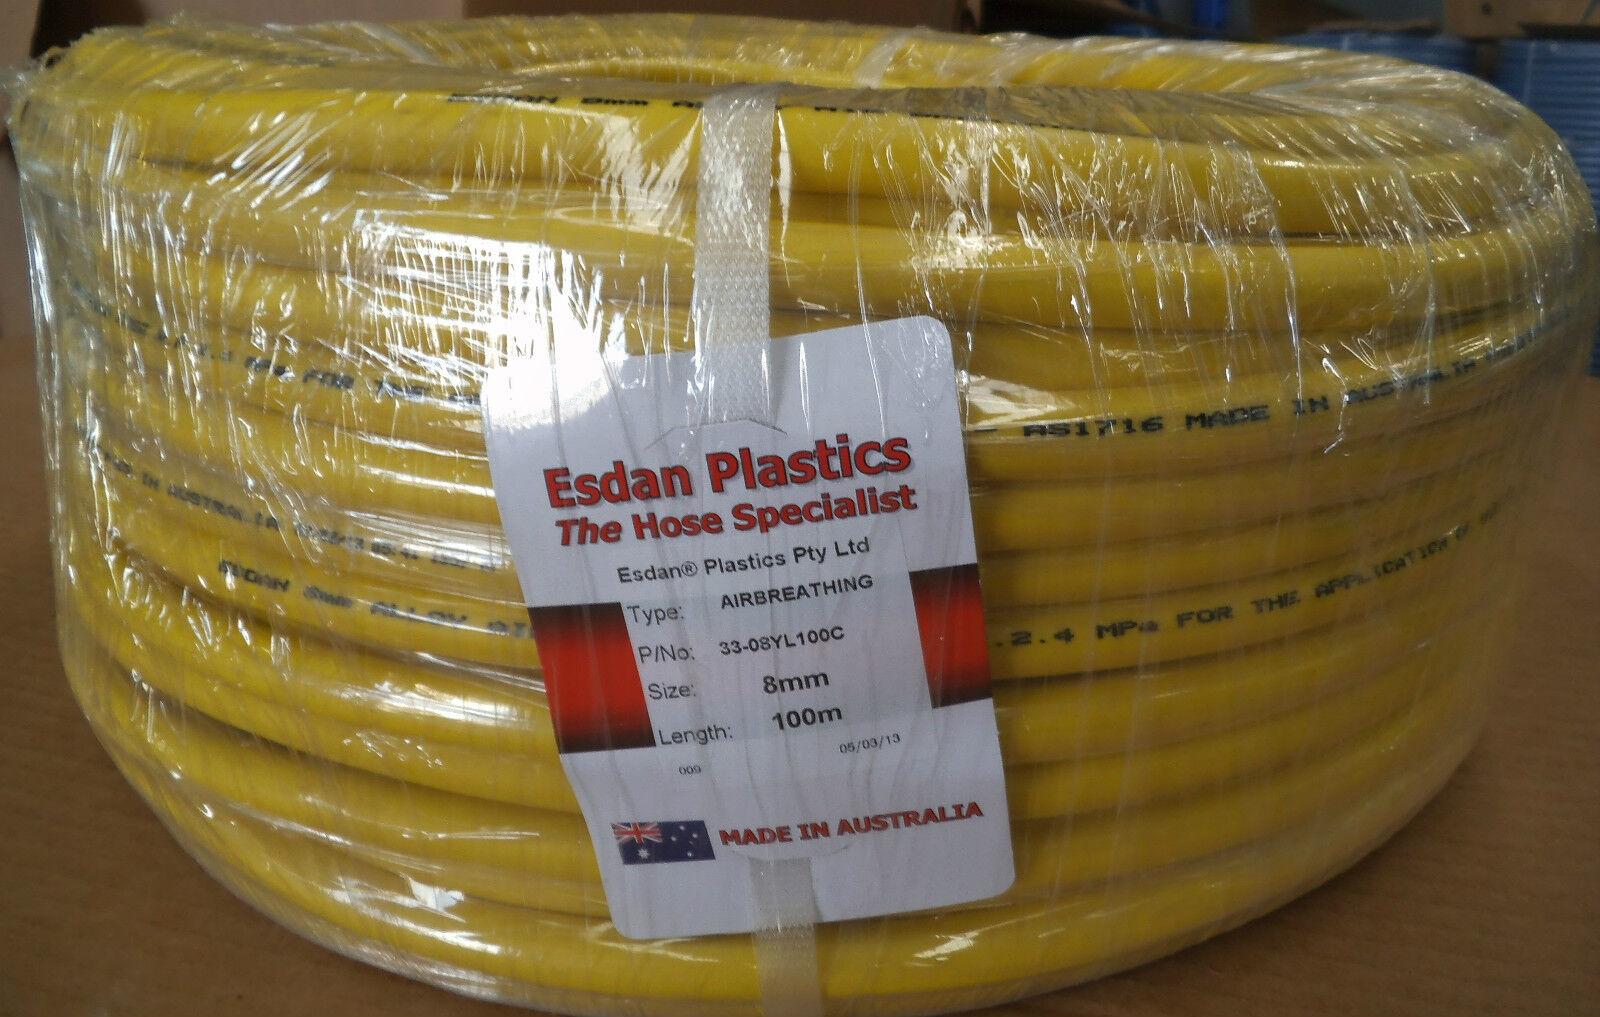 Divers Diving Air breathing Hookah hose 8mm x 100m coil Gelb Australian Esdan